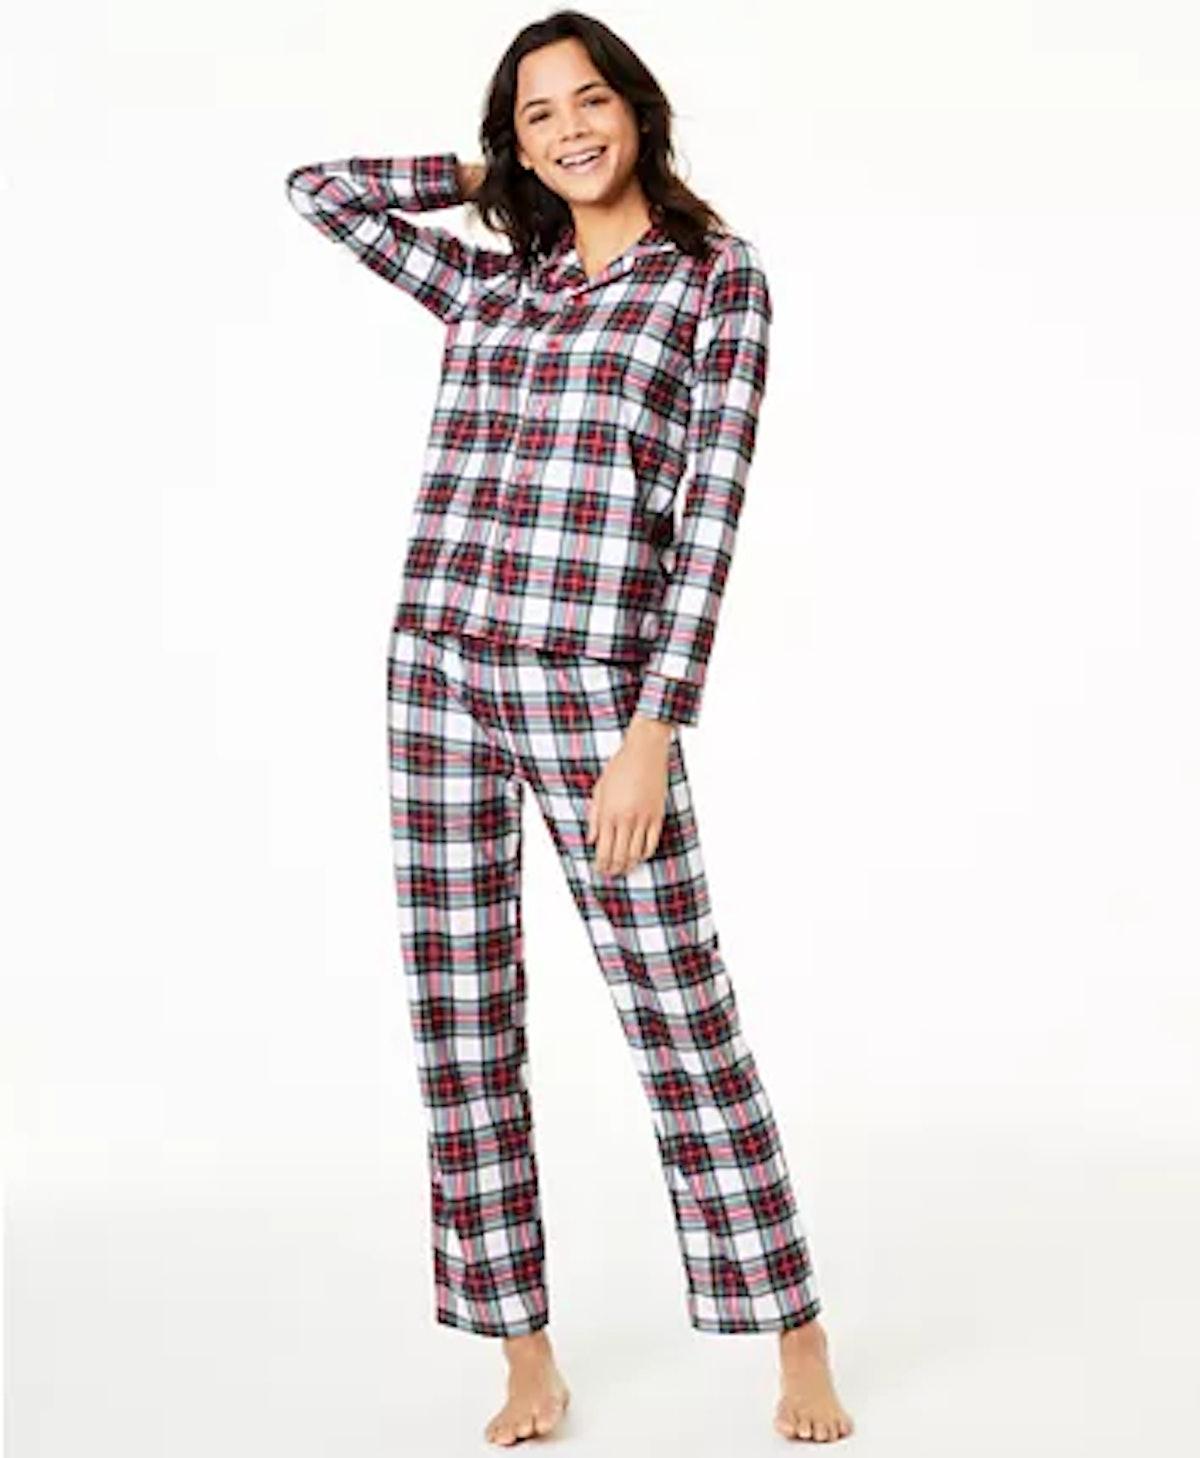 Macy's Matching Women's Stewart Plaid Family Pajama Set